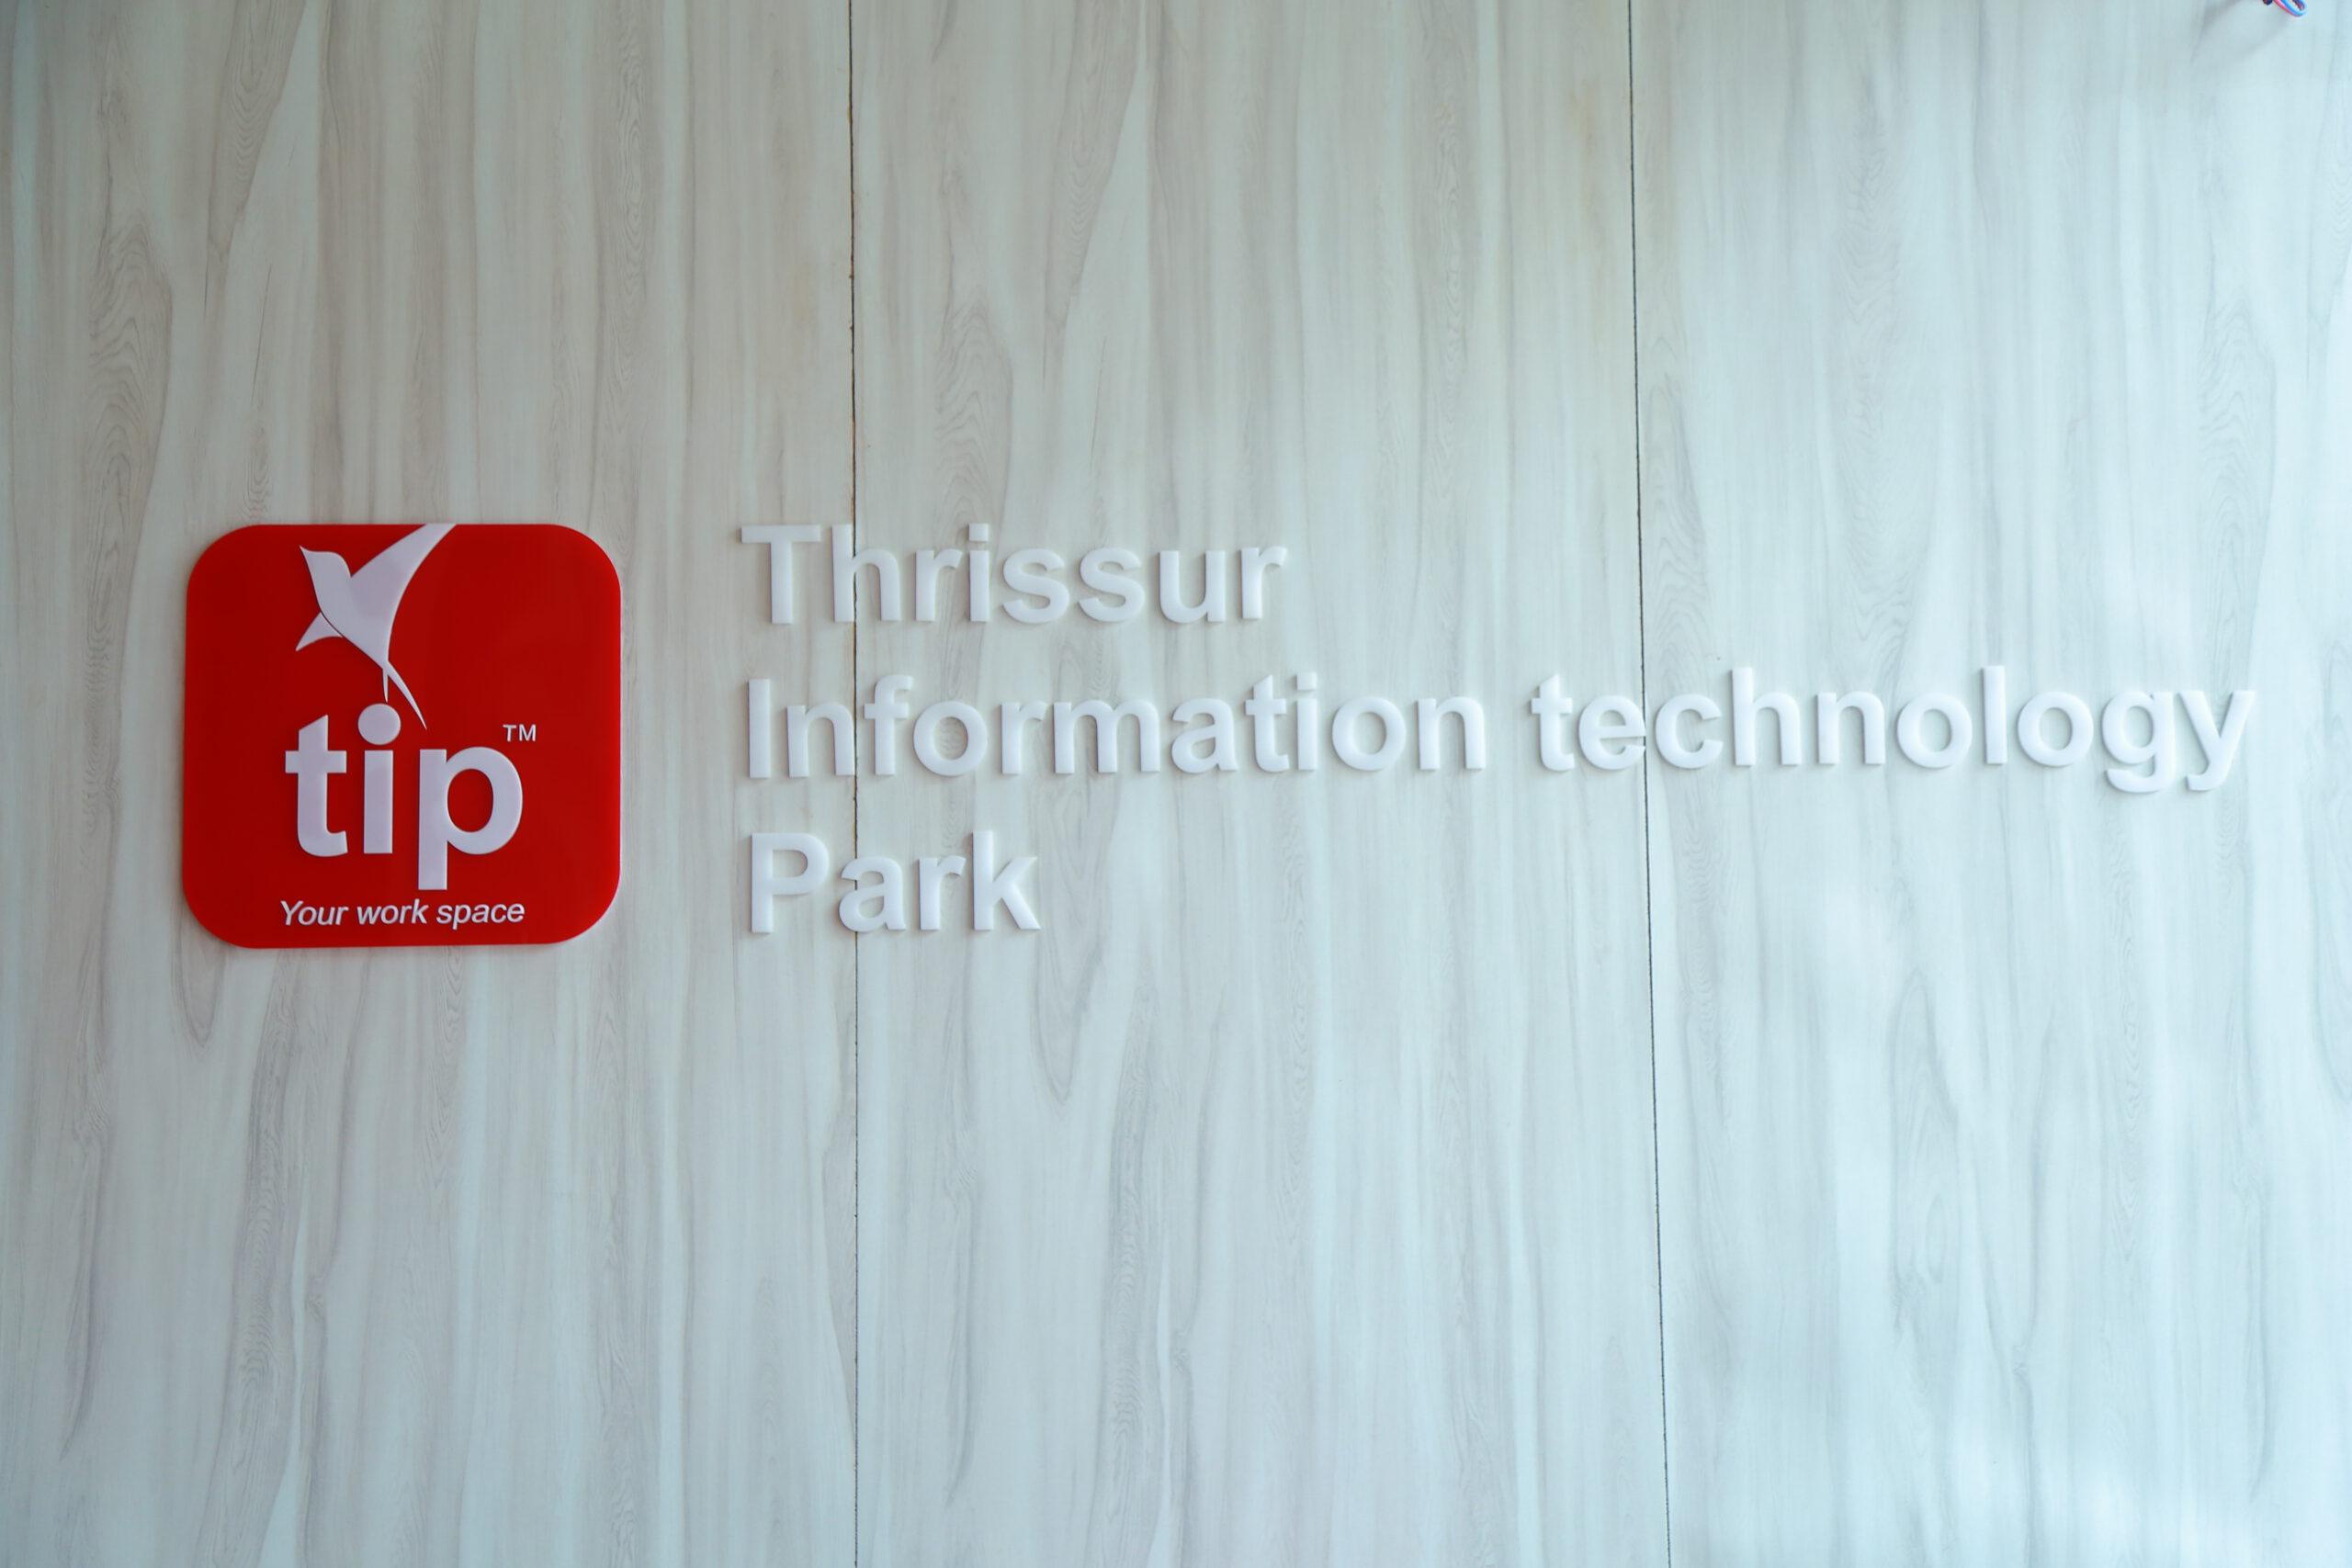 Thrissur IT Park